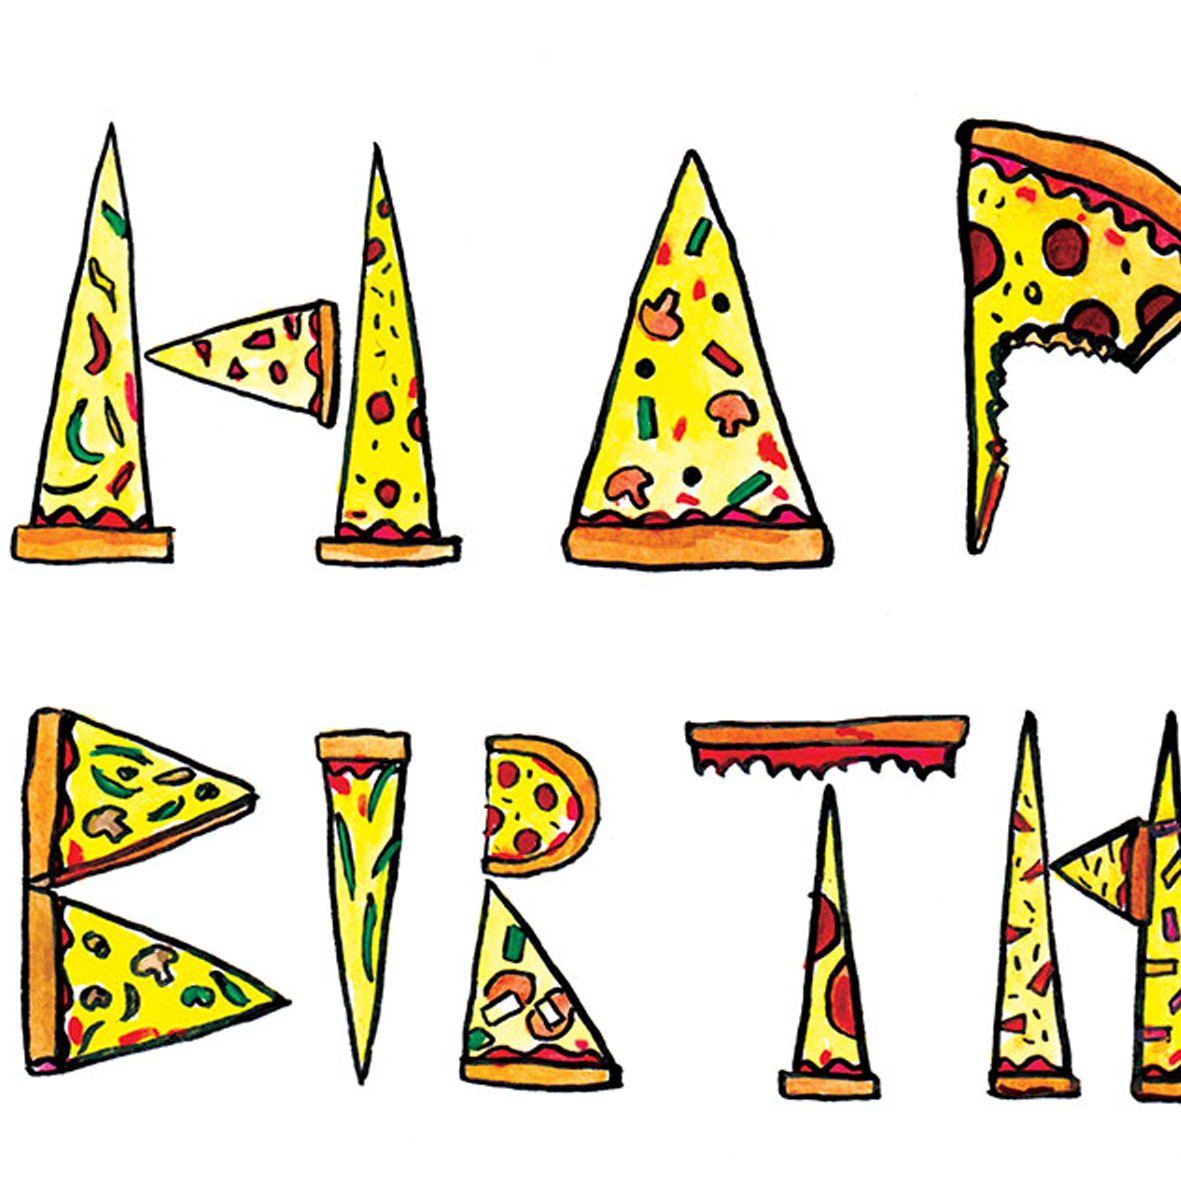 Pizza-Birthday_-Pizza-illustration-birthday-card.-Birthday-cards-for-pizza-lovers_BD05_CU